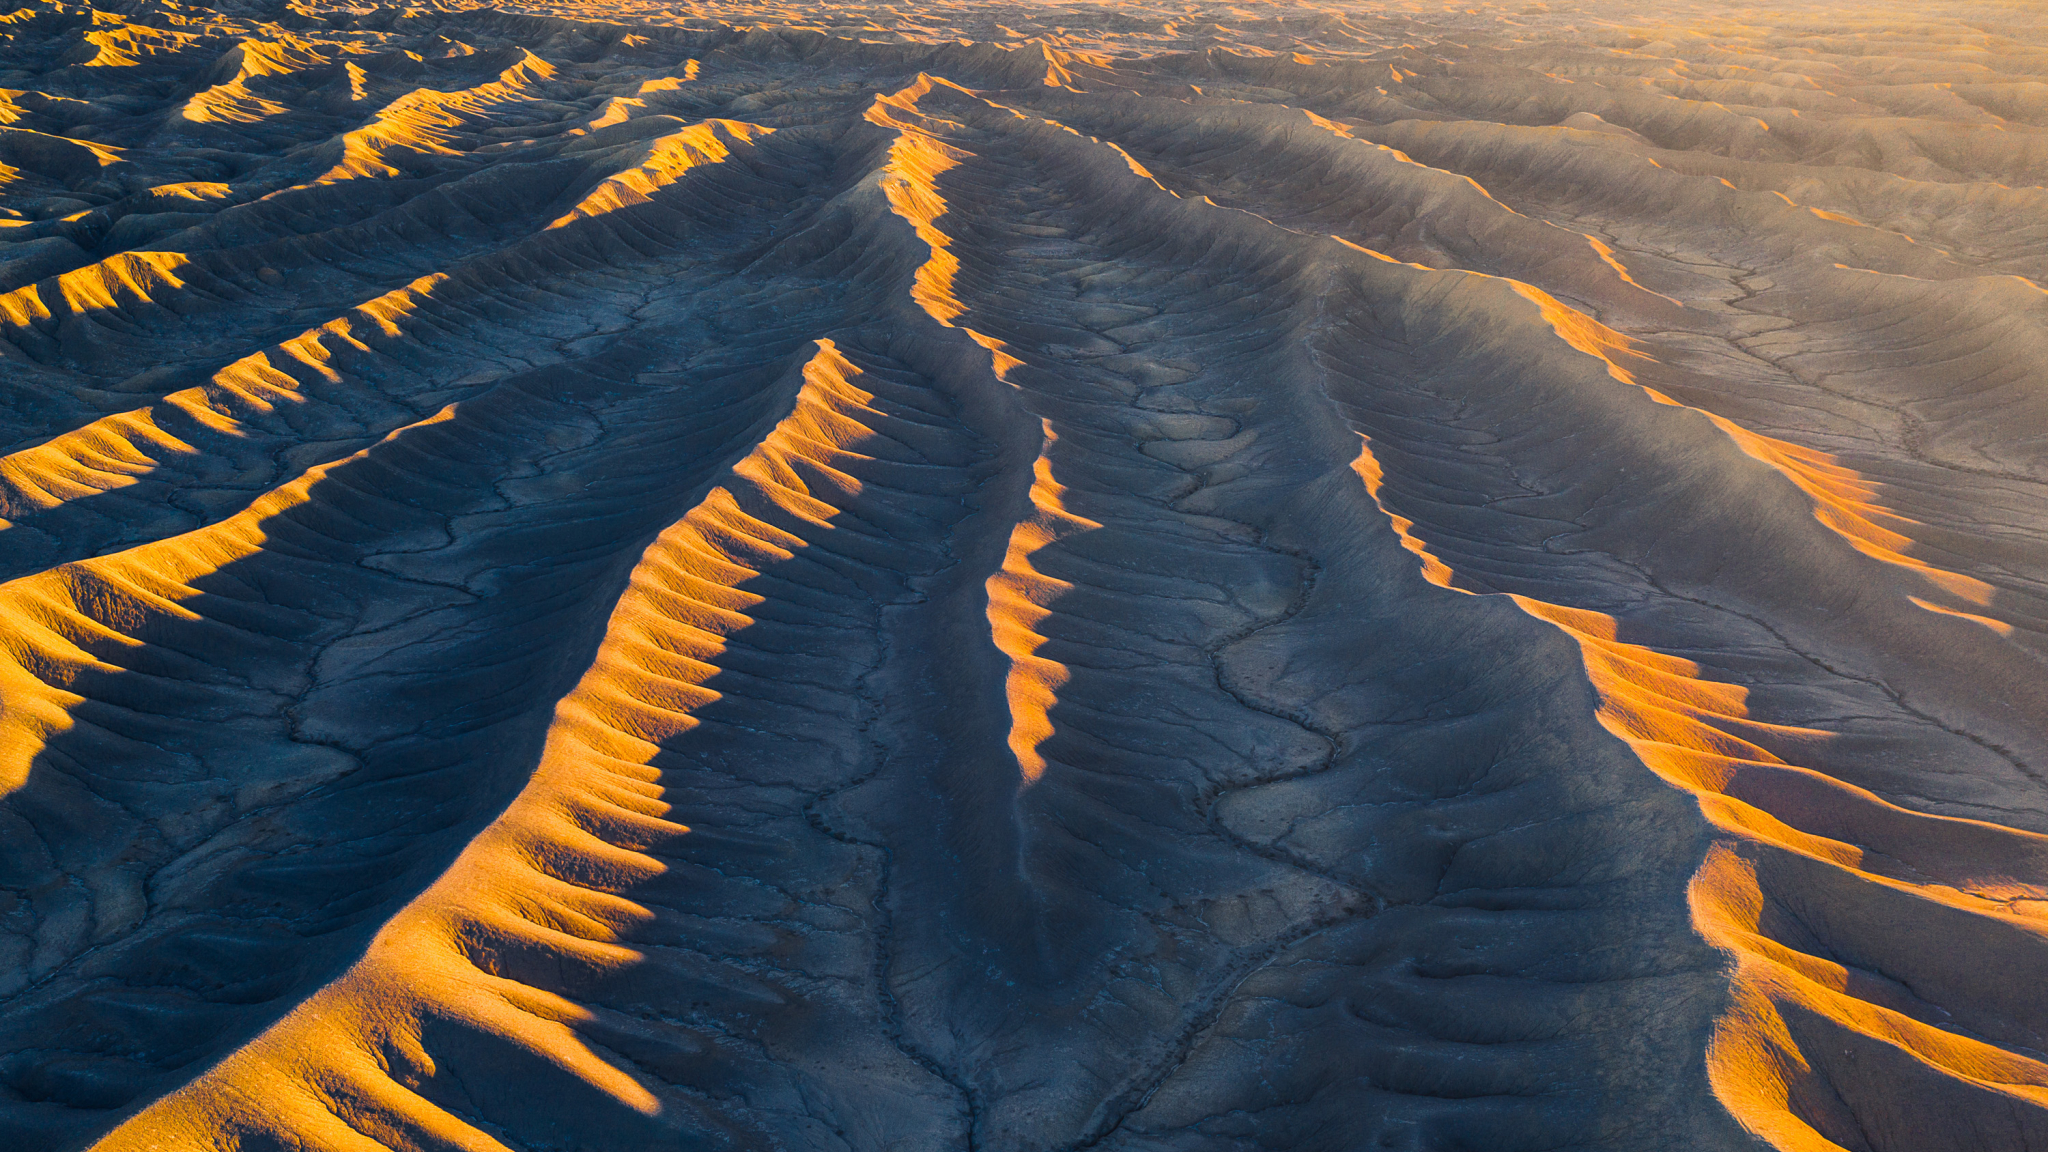 Aerial View From Utah Desert Wallpaper in 2048x1152 Resolution